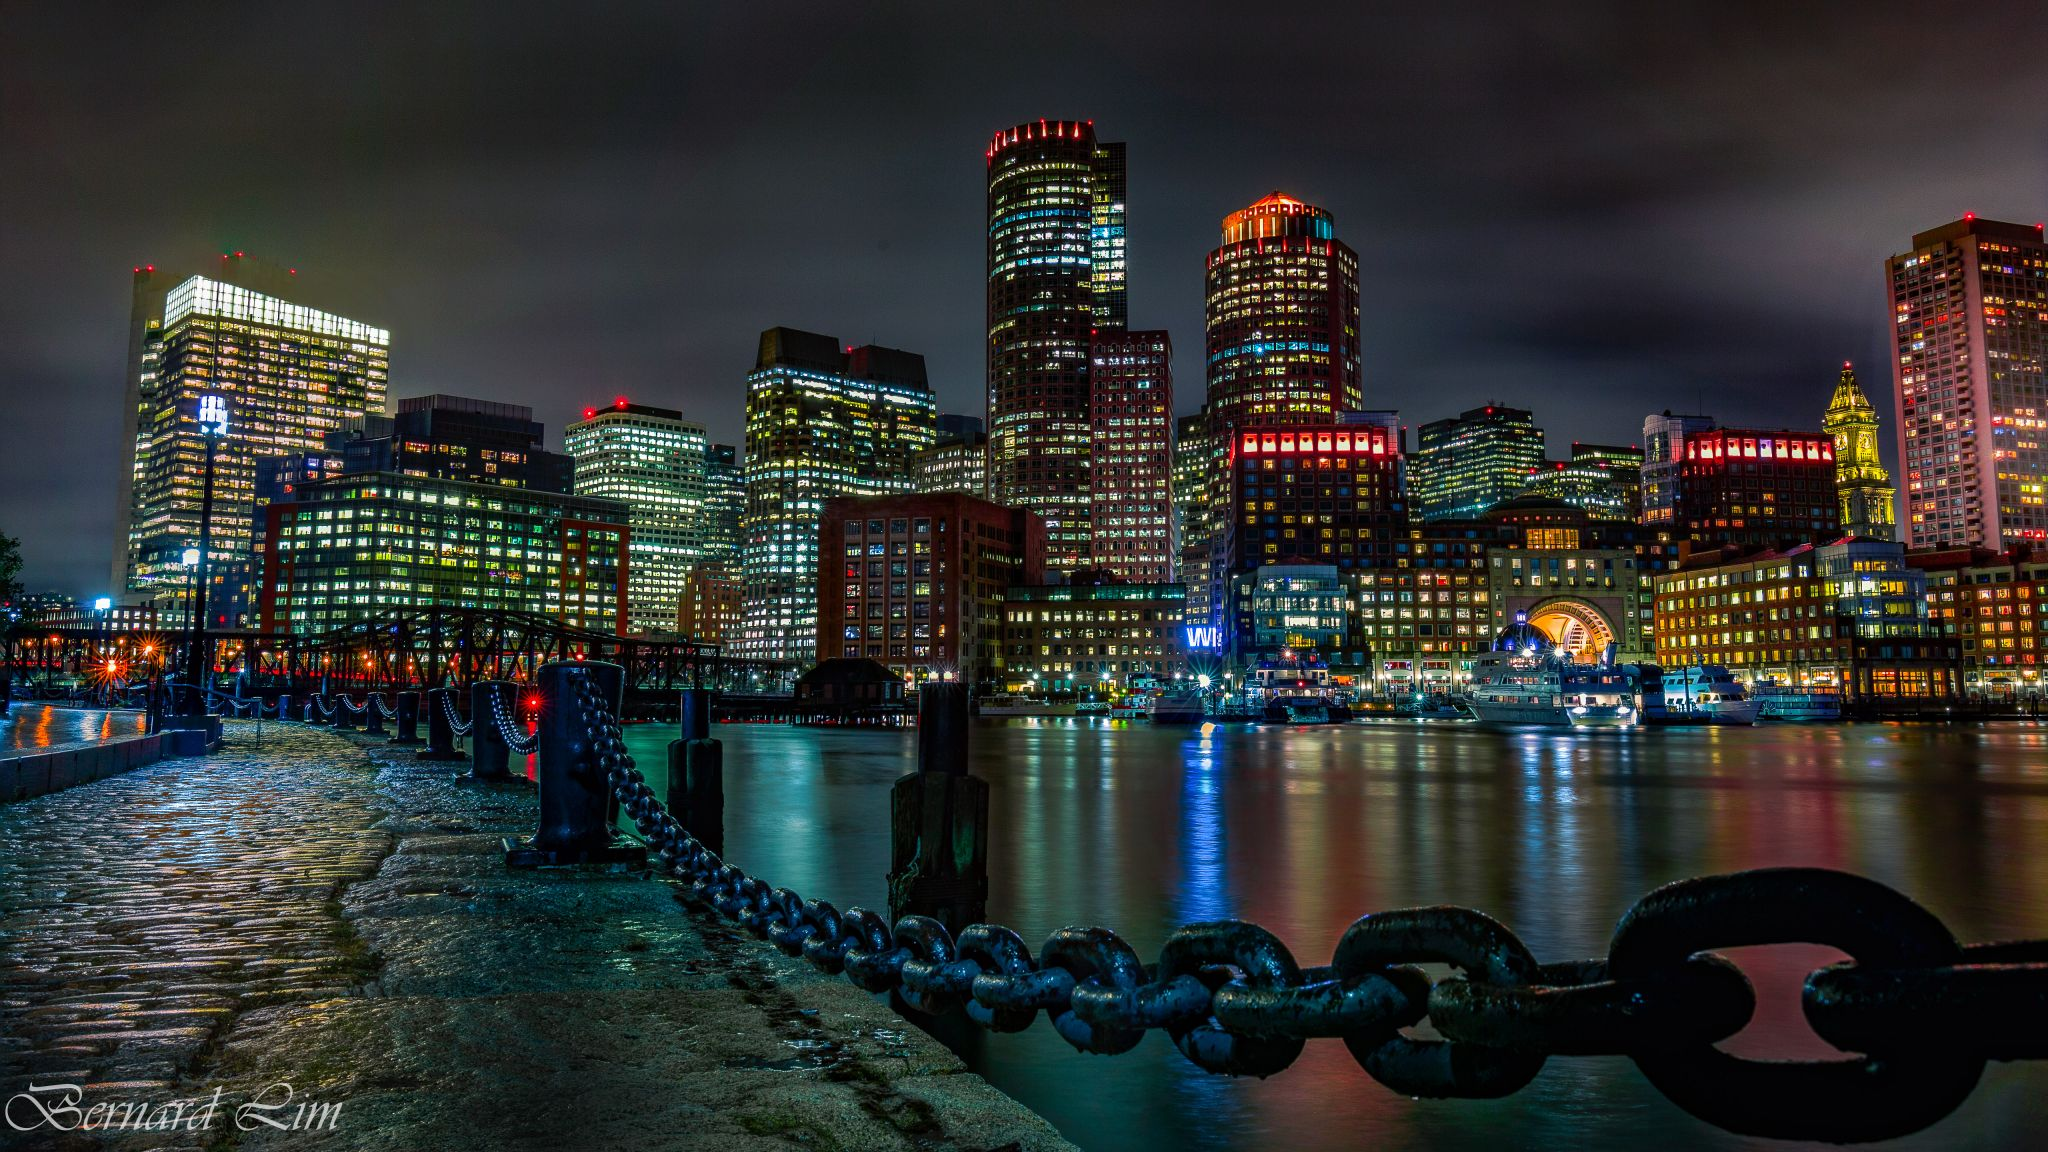 Boston Harbour after rain, USA